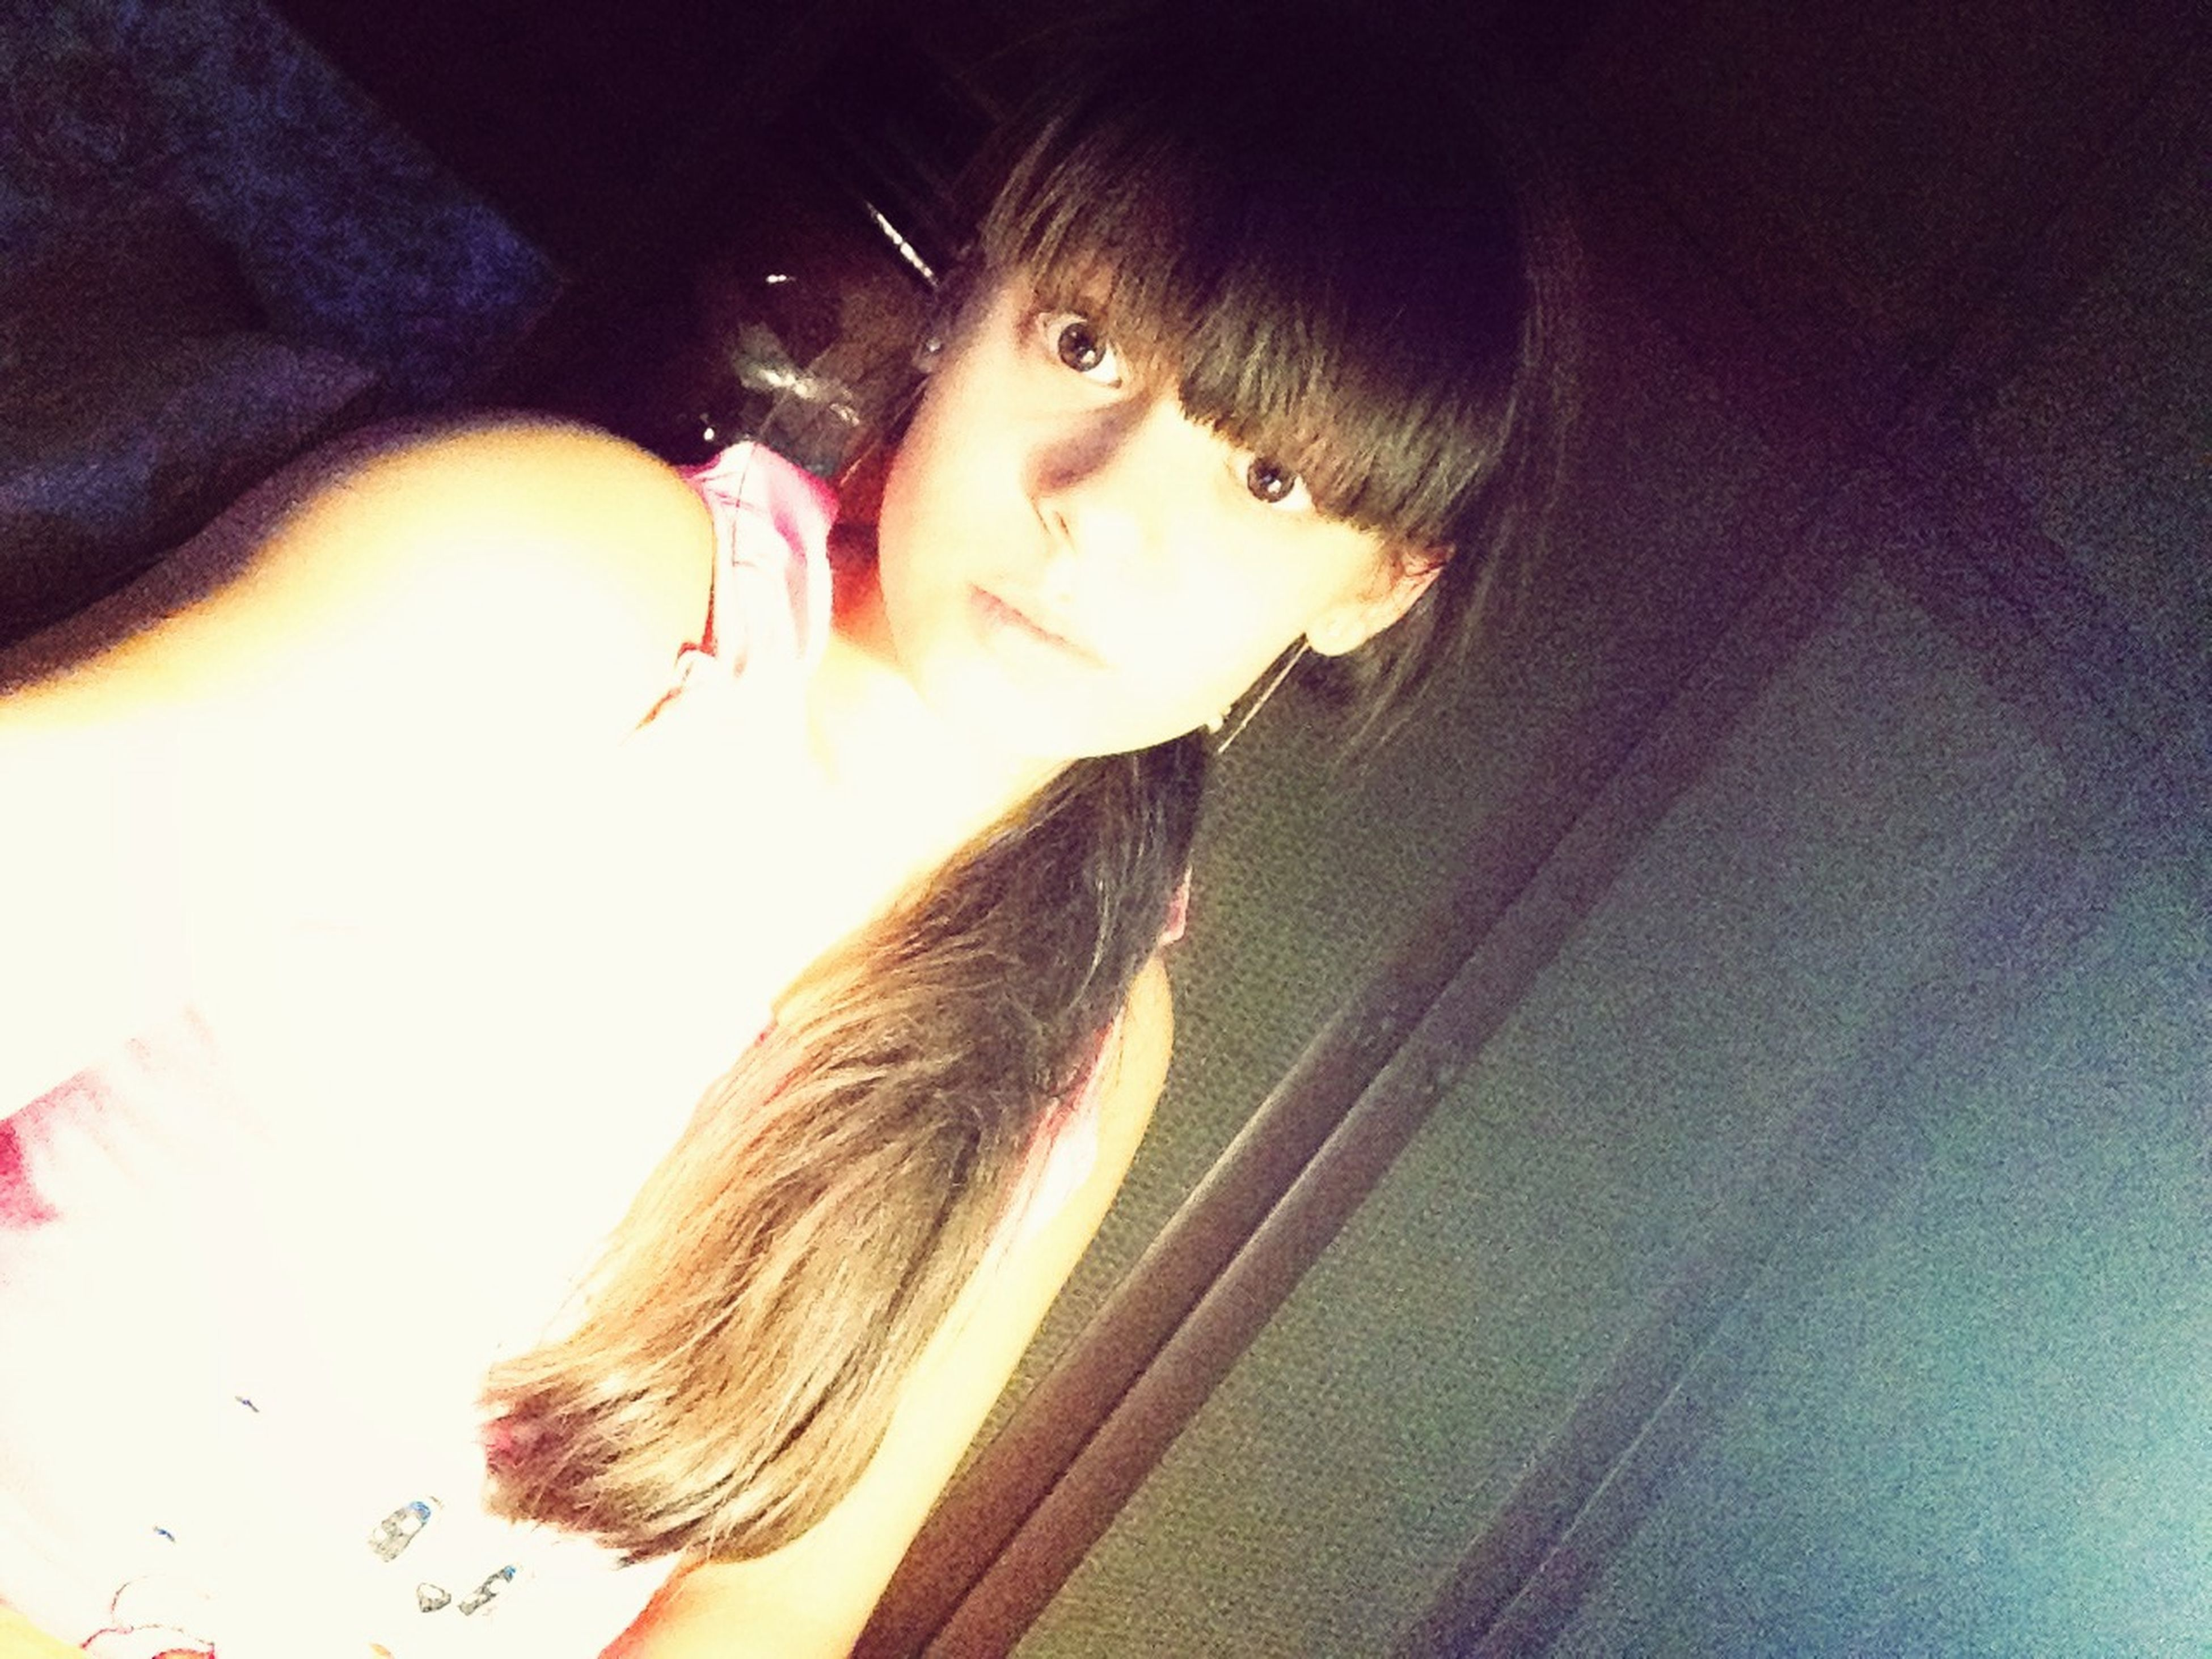 good night !! Love you